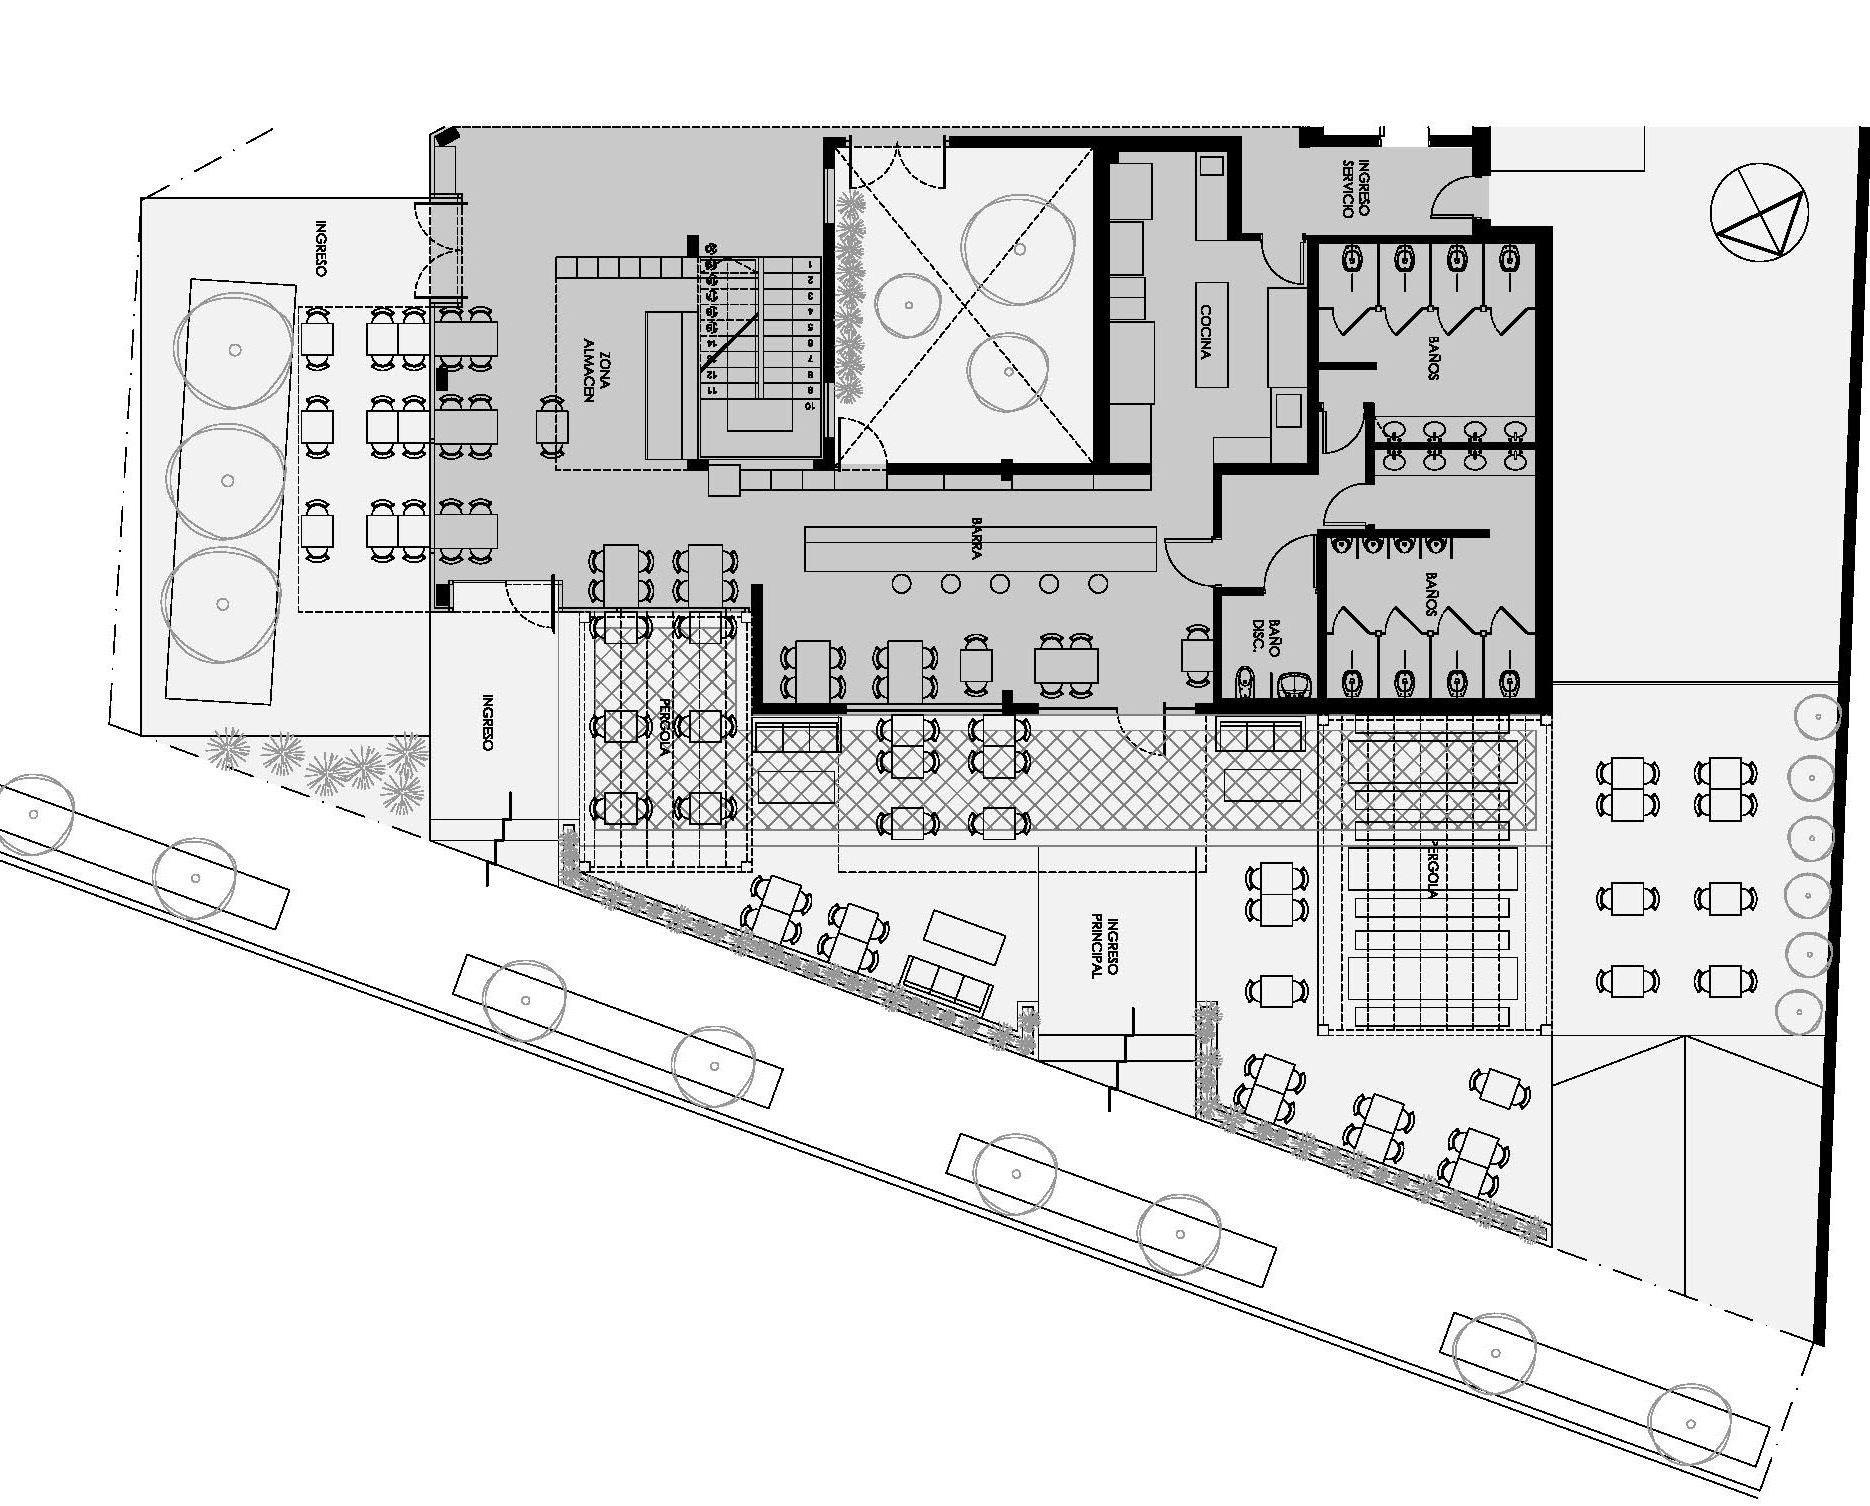 Kantine pablo dellatorre estudio montevideo archdaily for Dimensiones arquitectonicas